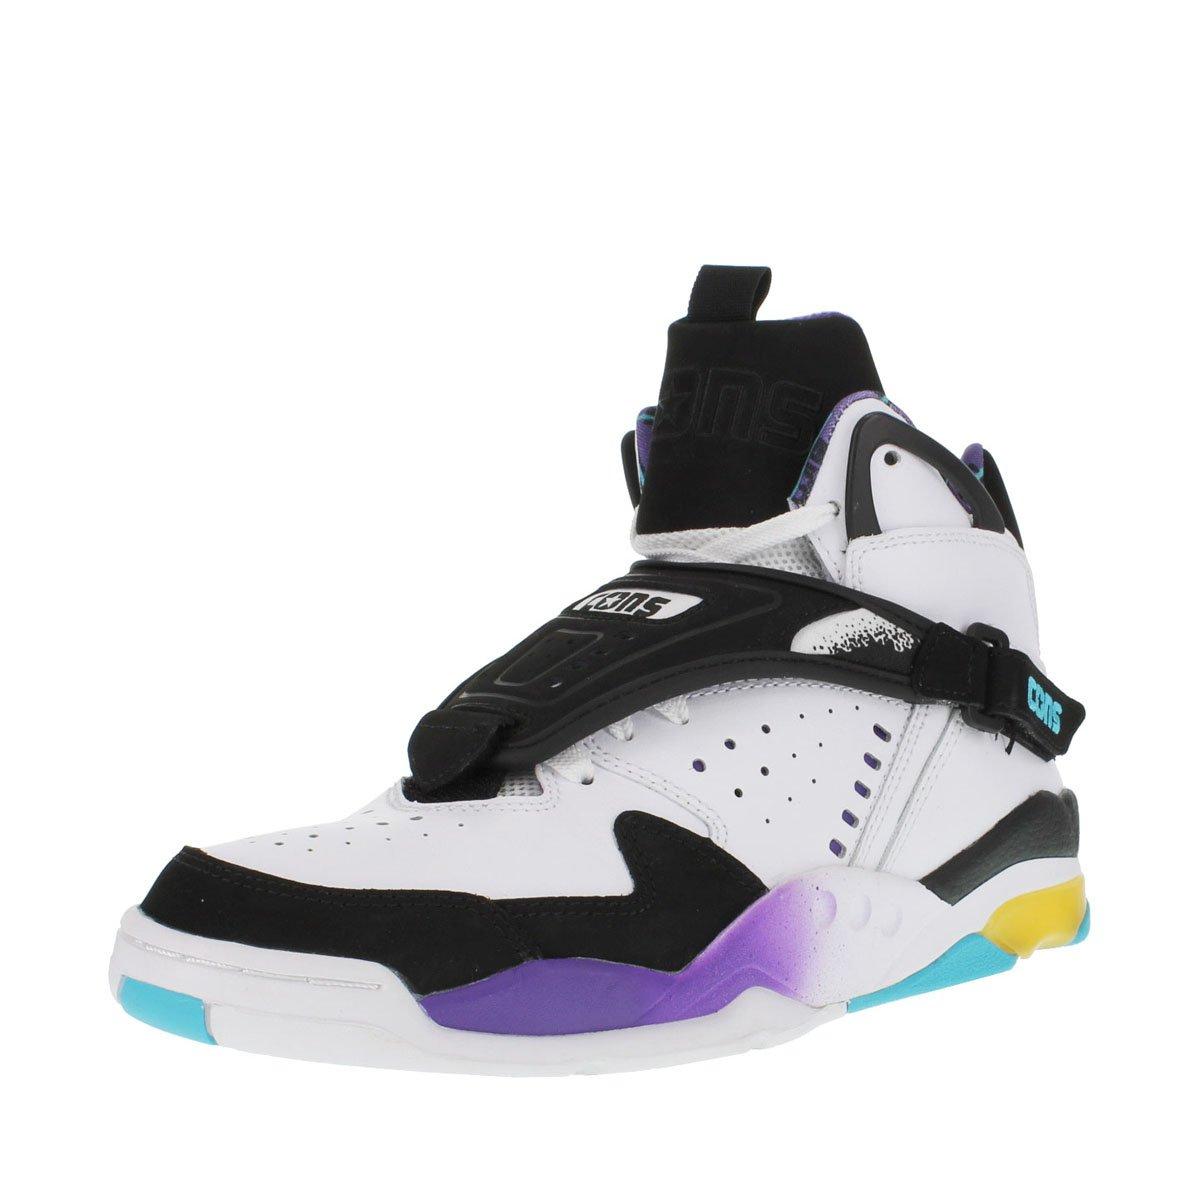 76ac88b27946 Converse aero jam hi grandmama larry johnson retro black white blue purple  yellow size basketball jpg